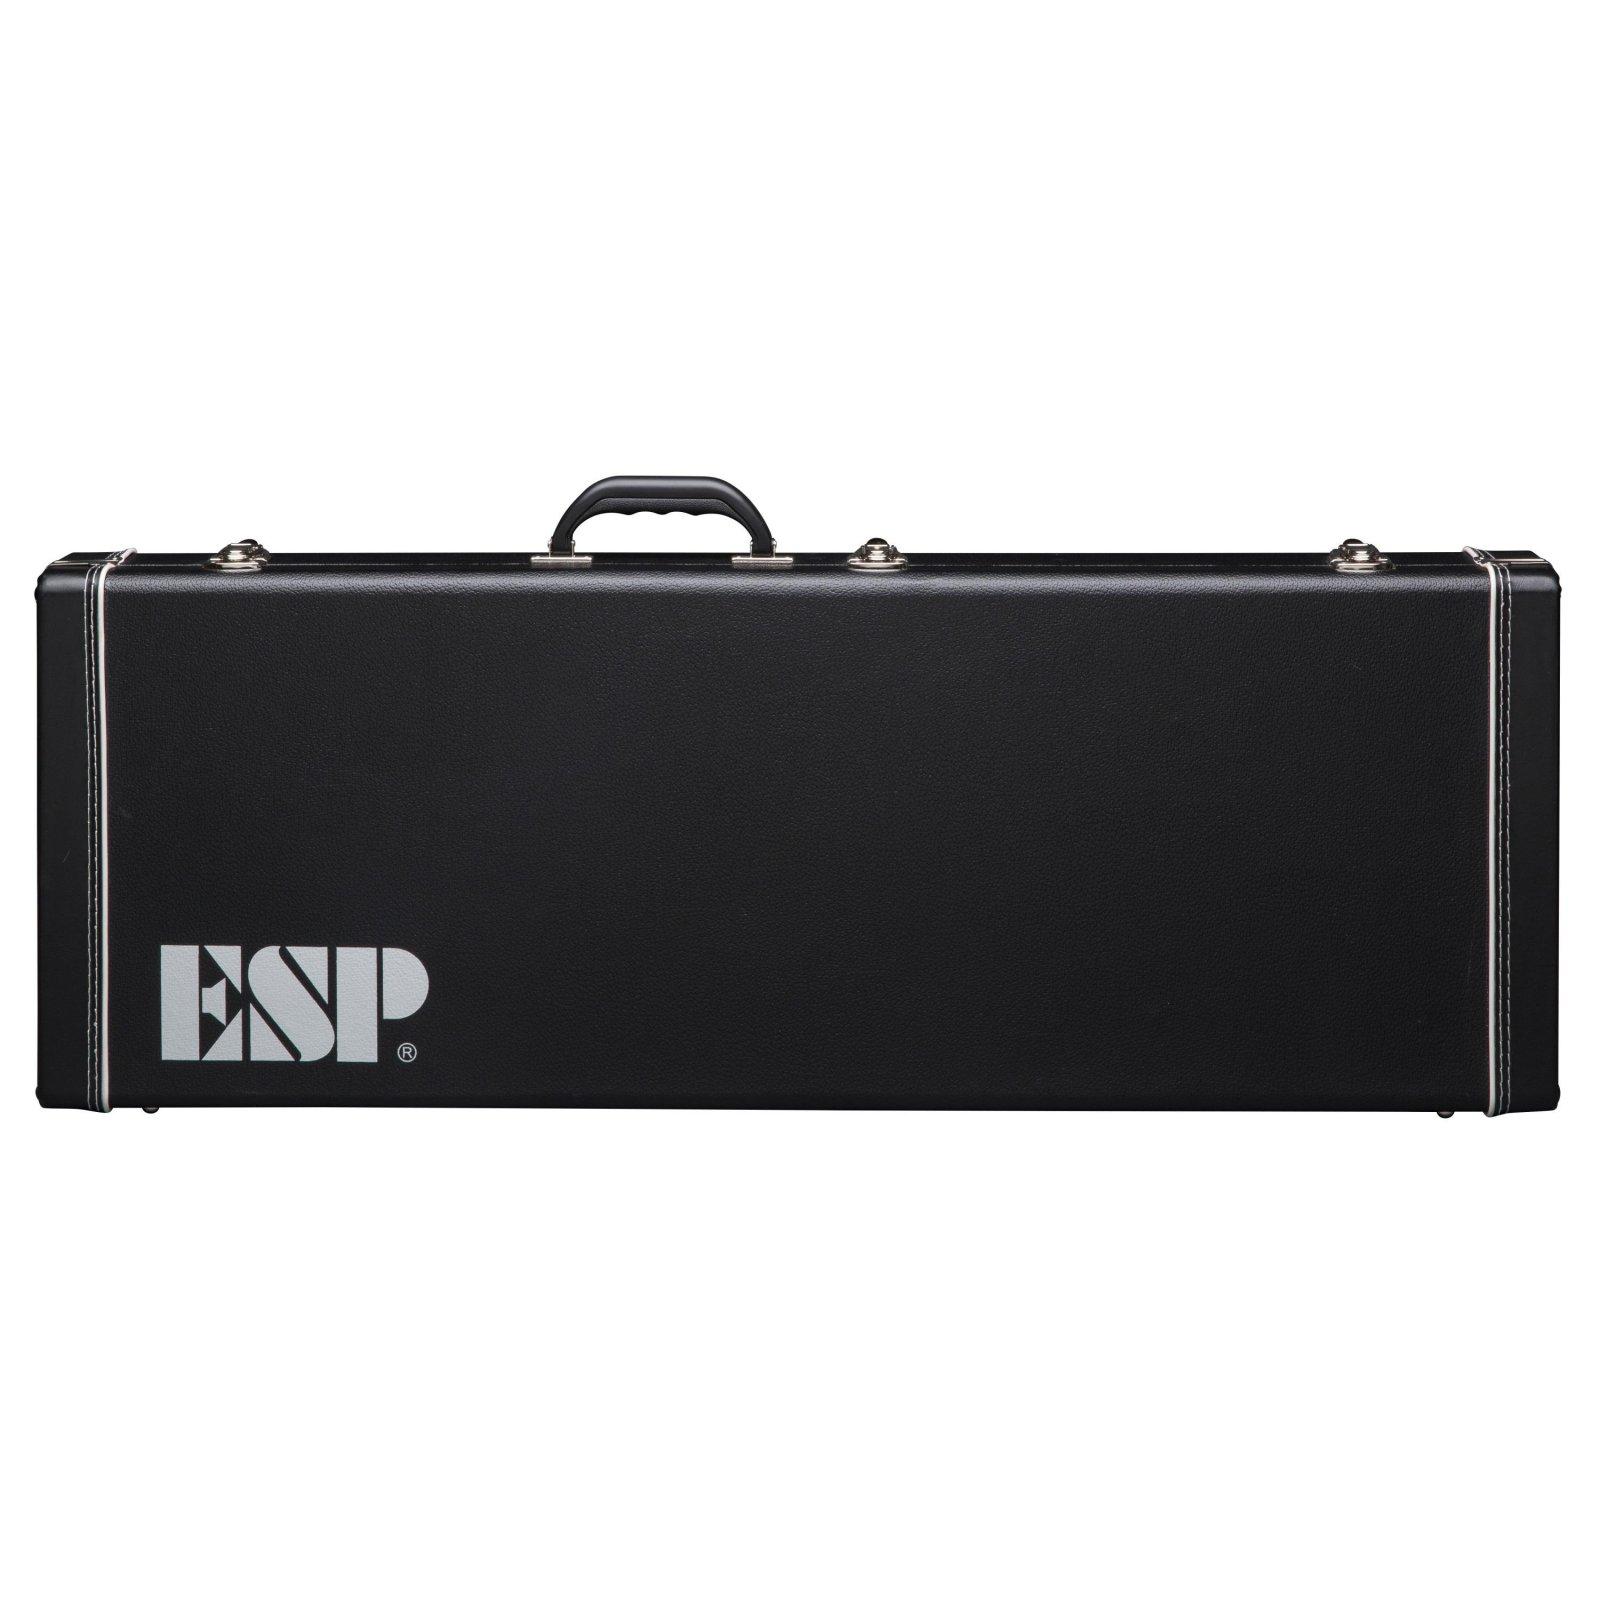 ESP EC Style Bass Case